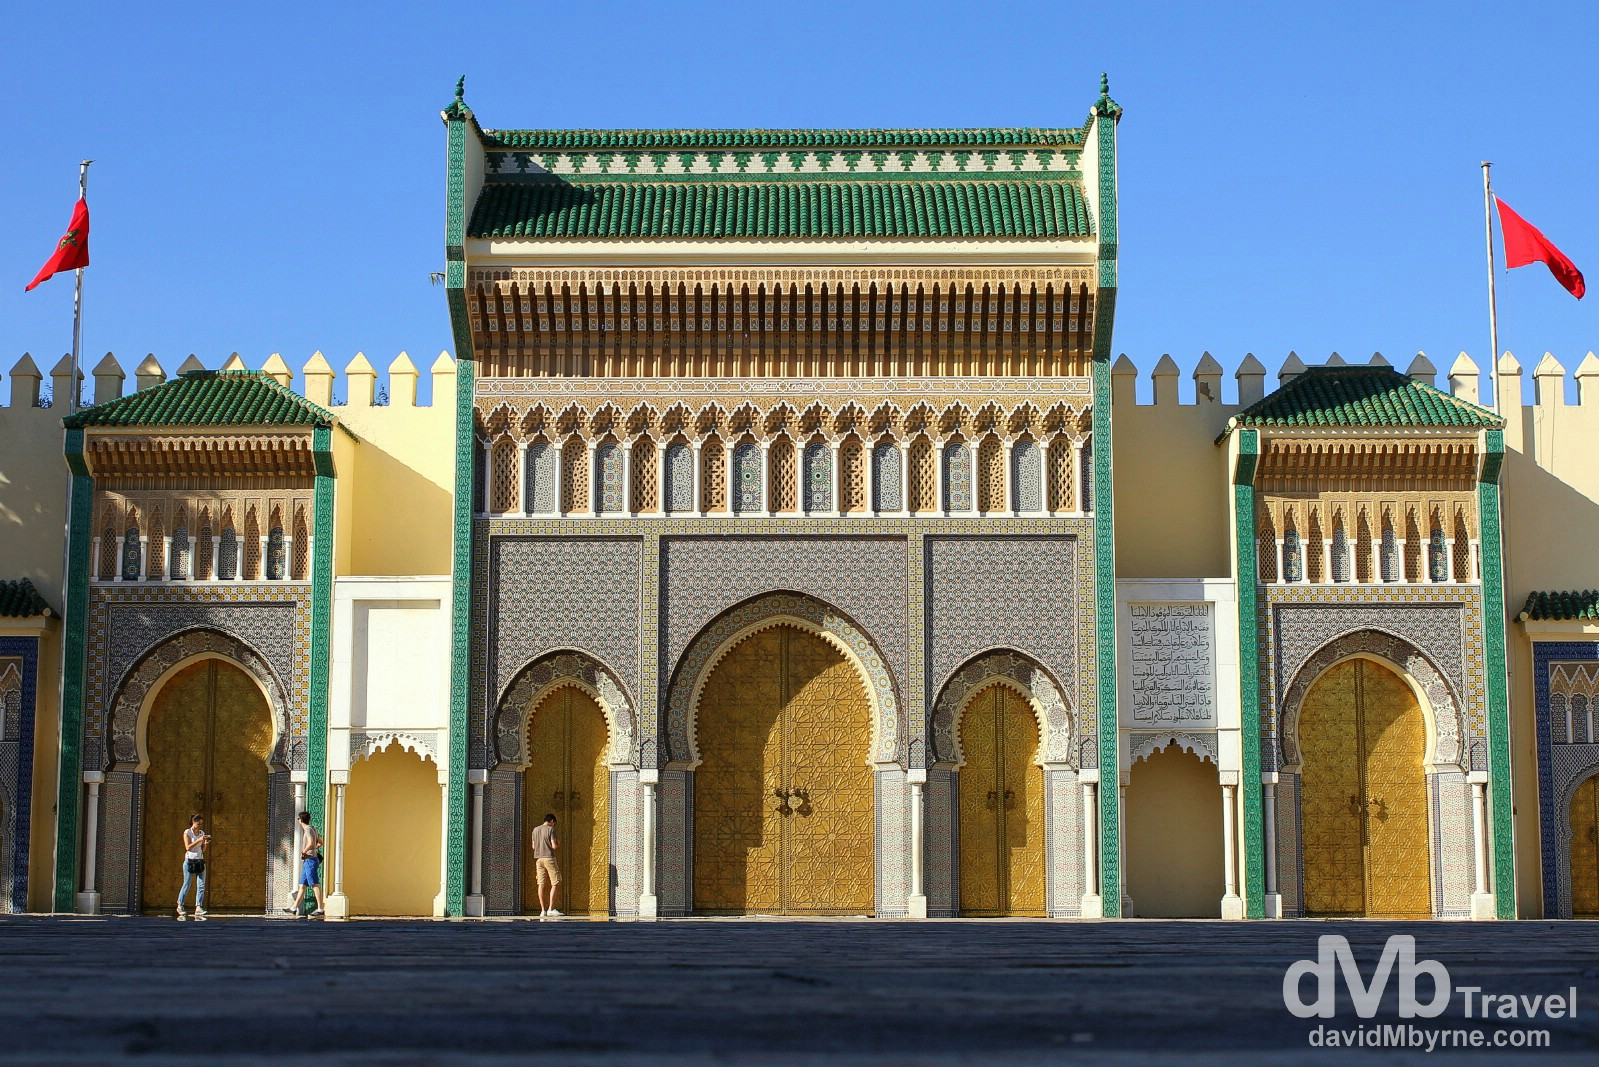 The Royal Palace, Fes, Morocco